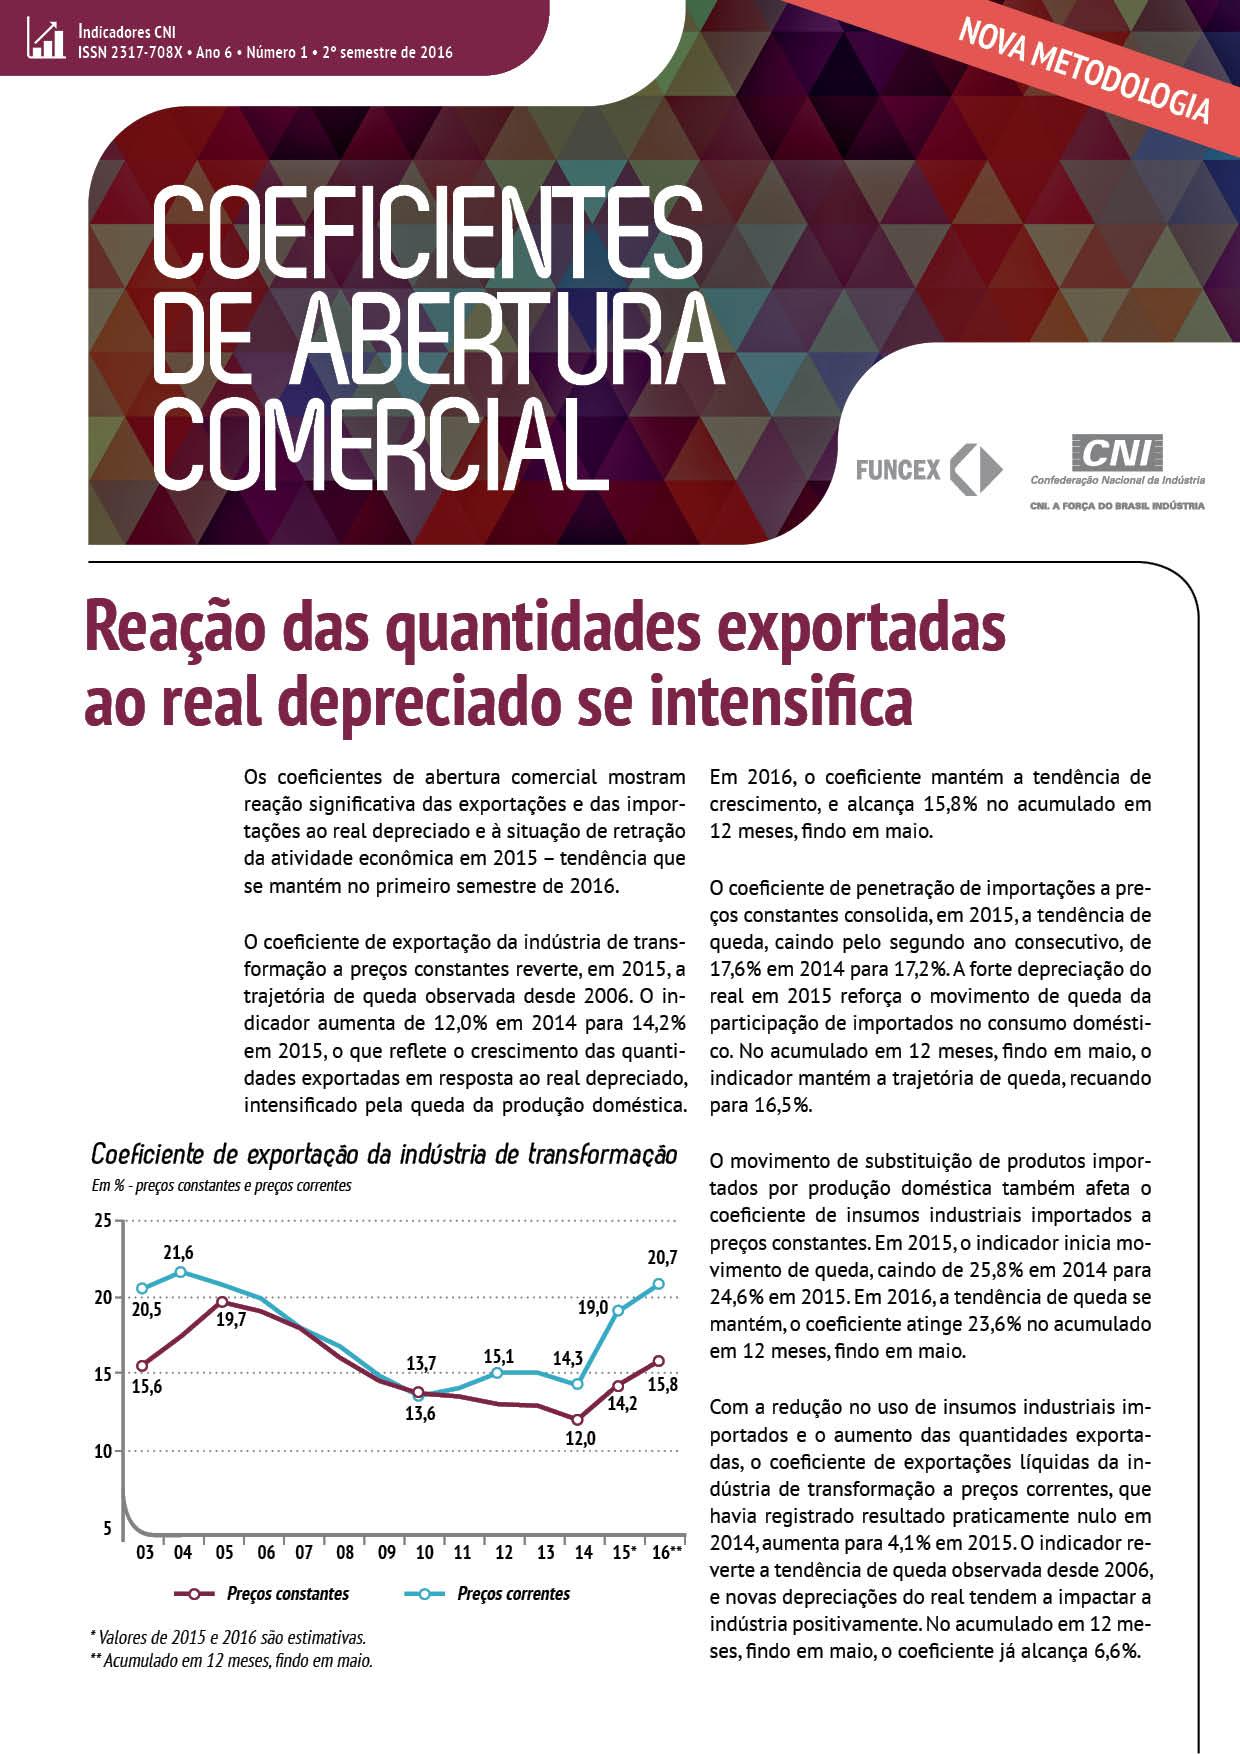 Coeficientes de Abertura Comercial